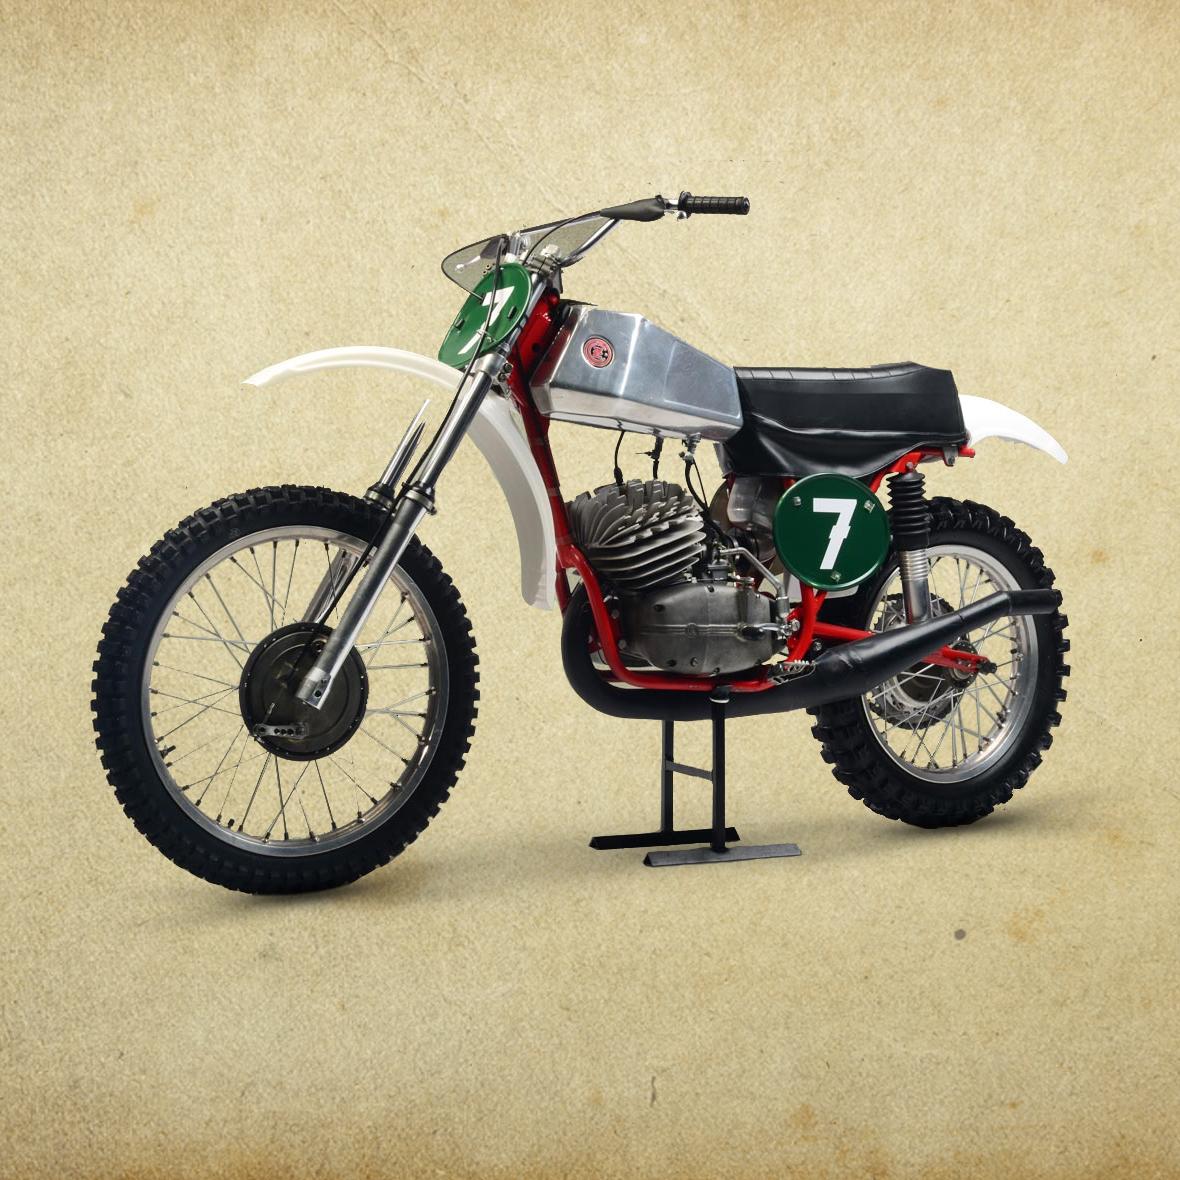 jawa cz moto cross racing bike land